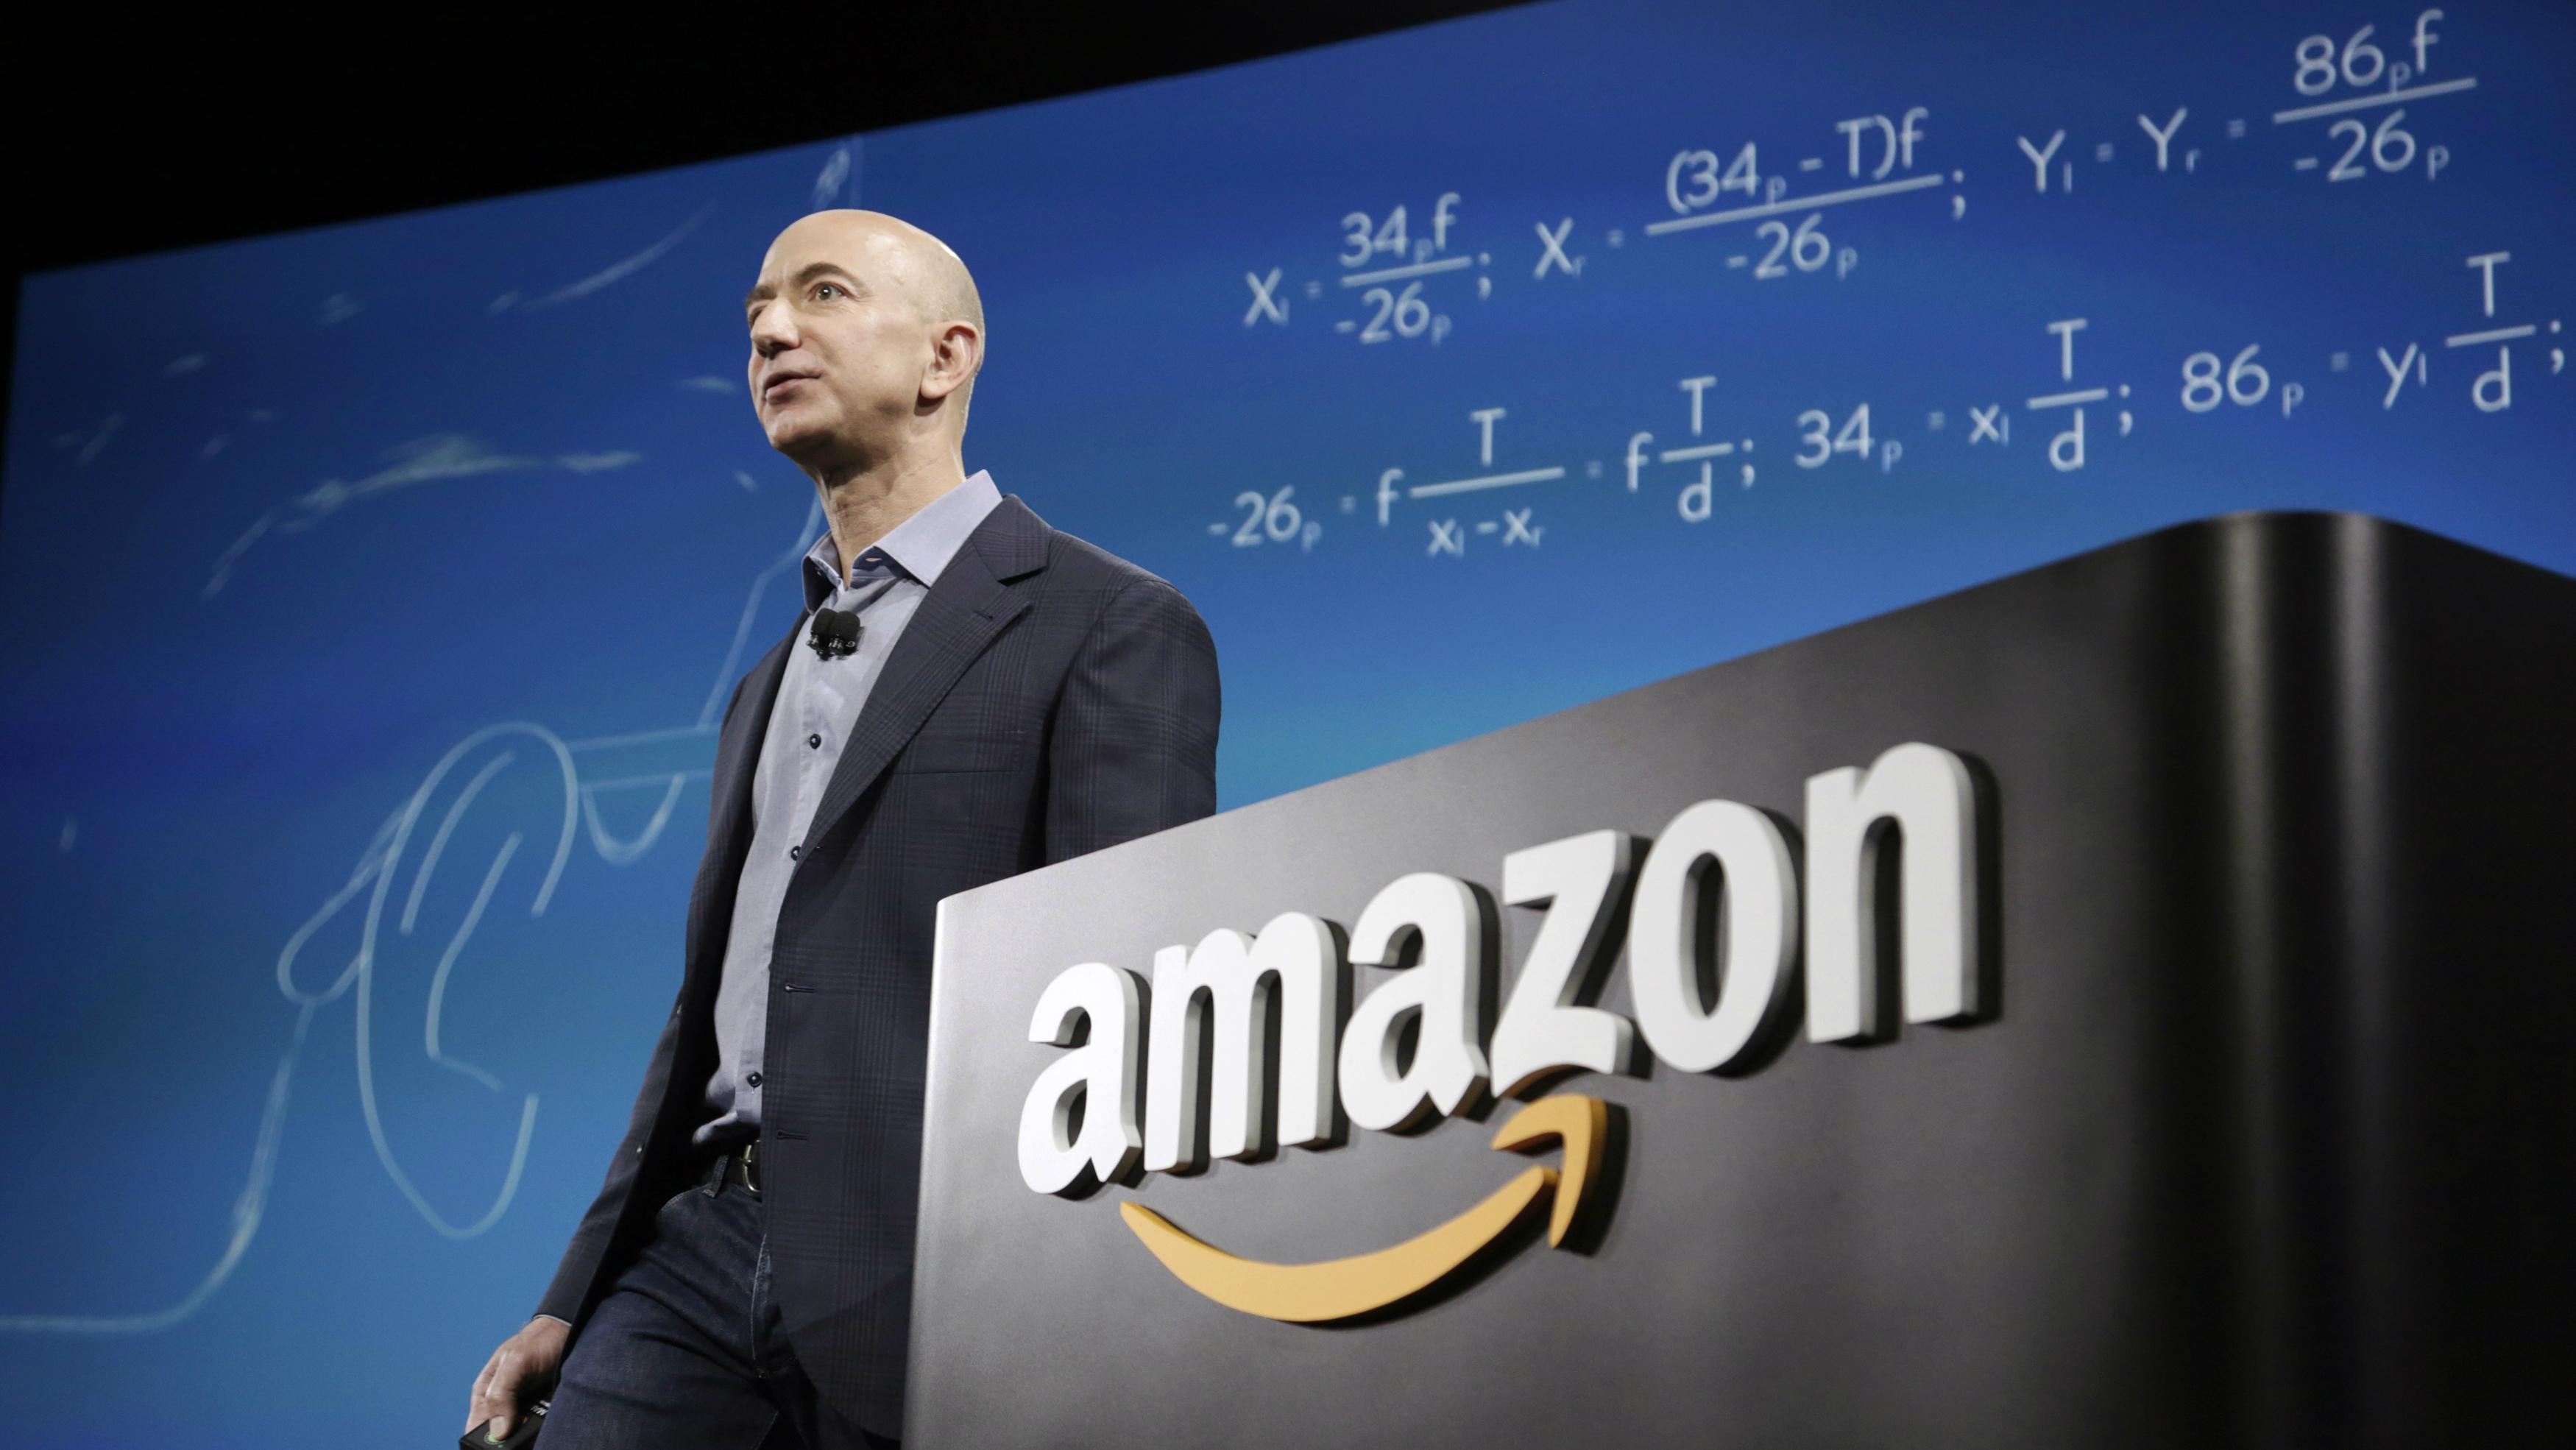 Amazon (AMZN) has so many interns that the Seattle transit